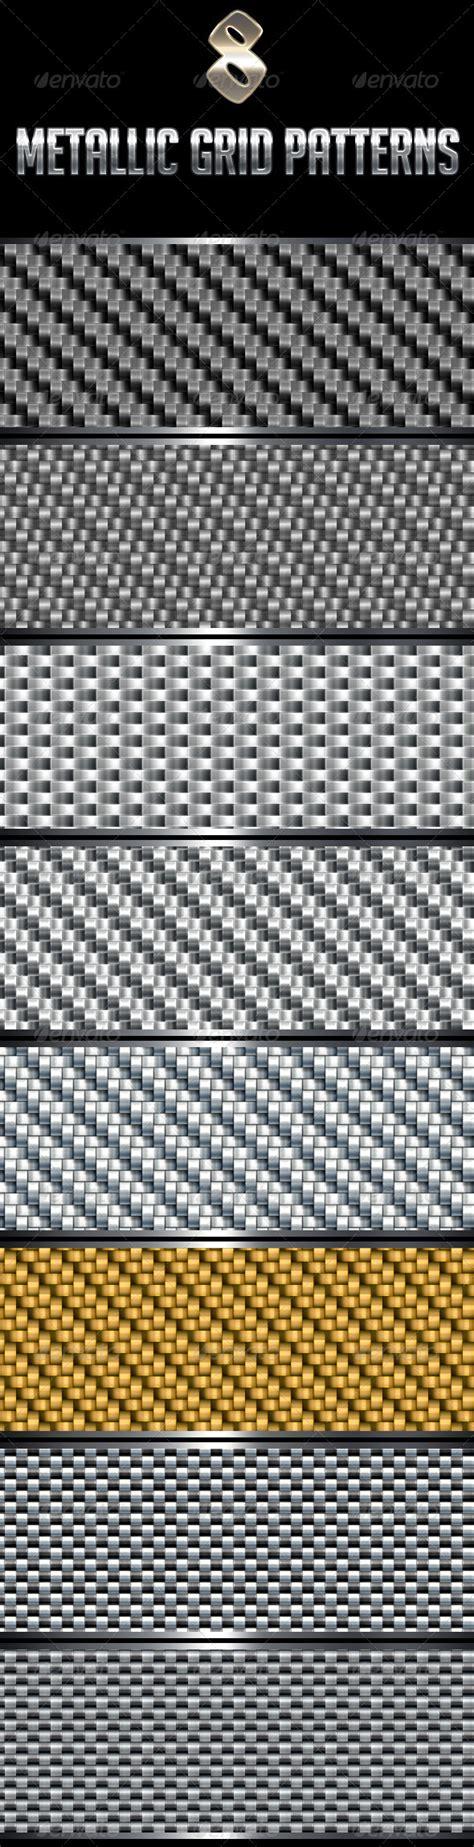 grid pattern c4d metallic gold texture c4d 187 tinkytyler org stock photos